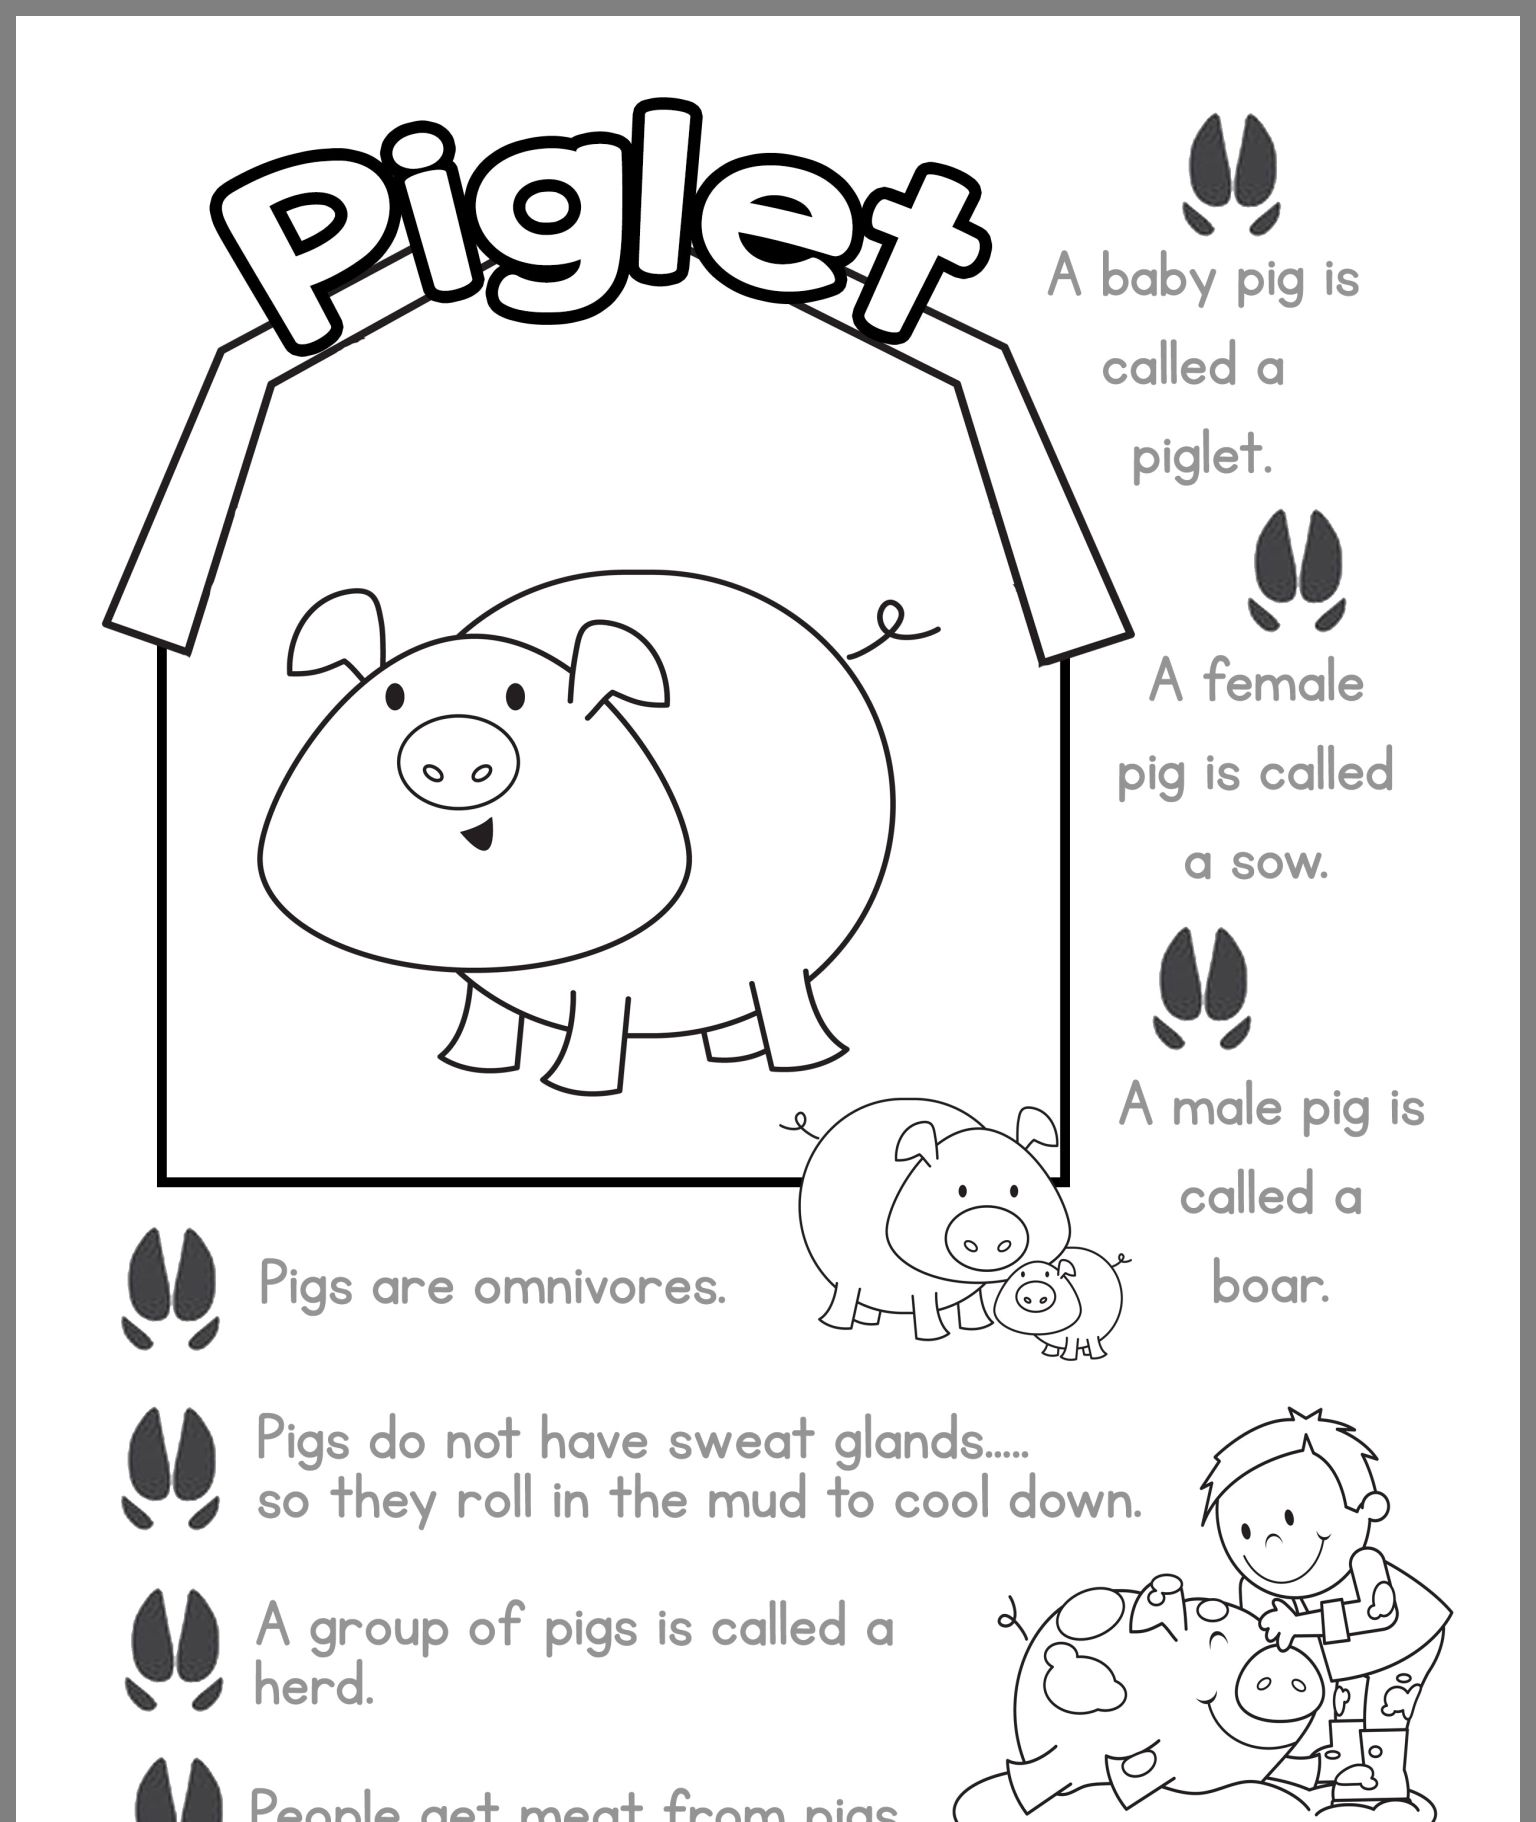 Pin By Jeanne Krow On Farm Baby Farm Animals Farm Preschool Pig Facts For Kids [ 1822 x 1536 Pixel ]